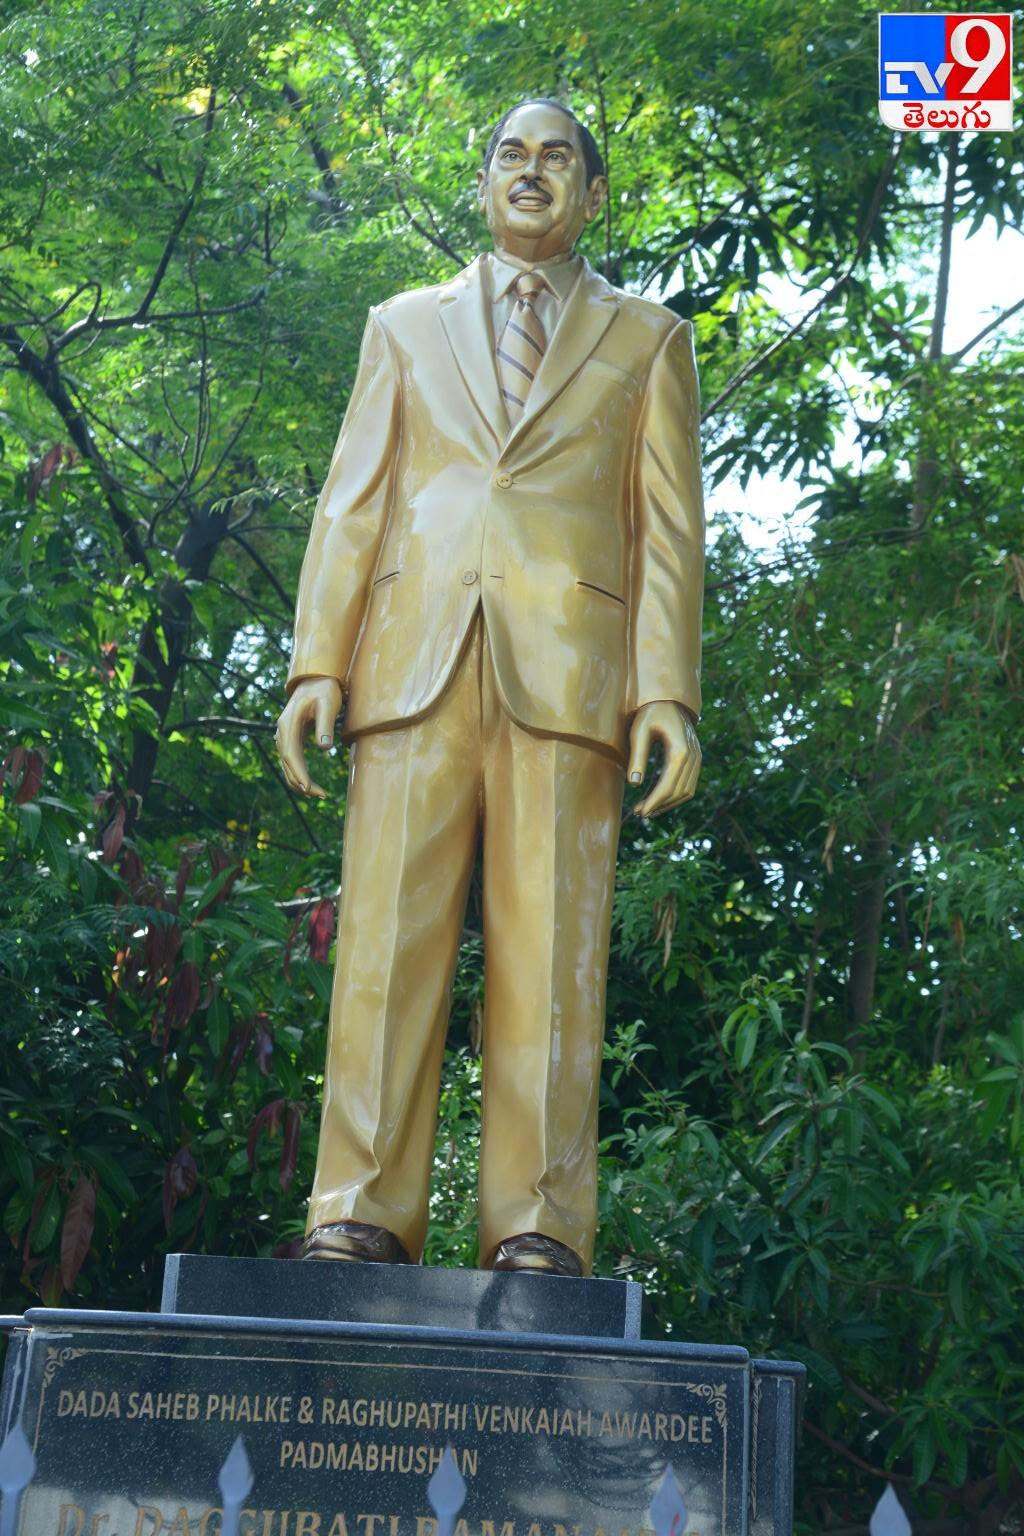 Dr D Ramanaidu 85th birth anniversary, ఘనంగా మూవీ మొగల్ డా.డి రామానాయుడు 85వ జయంతి వేడుకలు